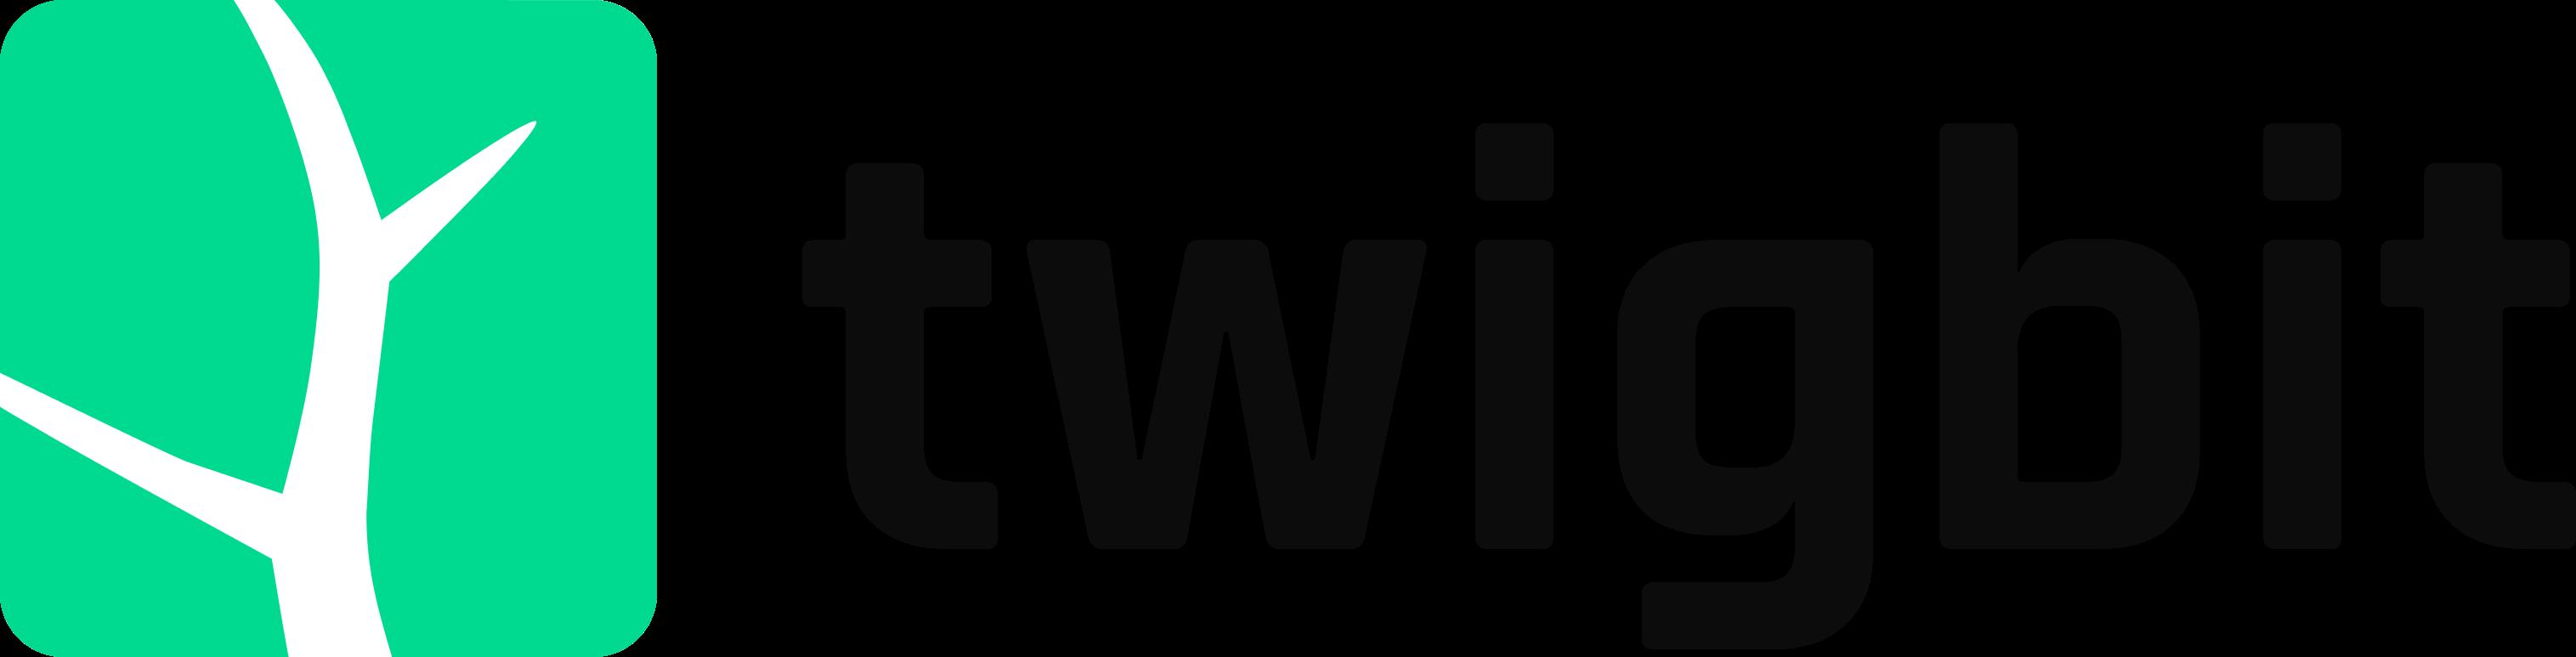 twigbit logo